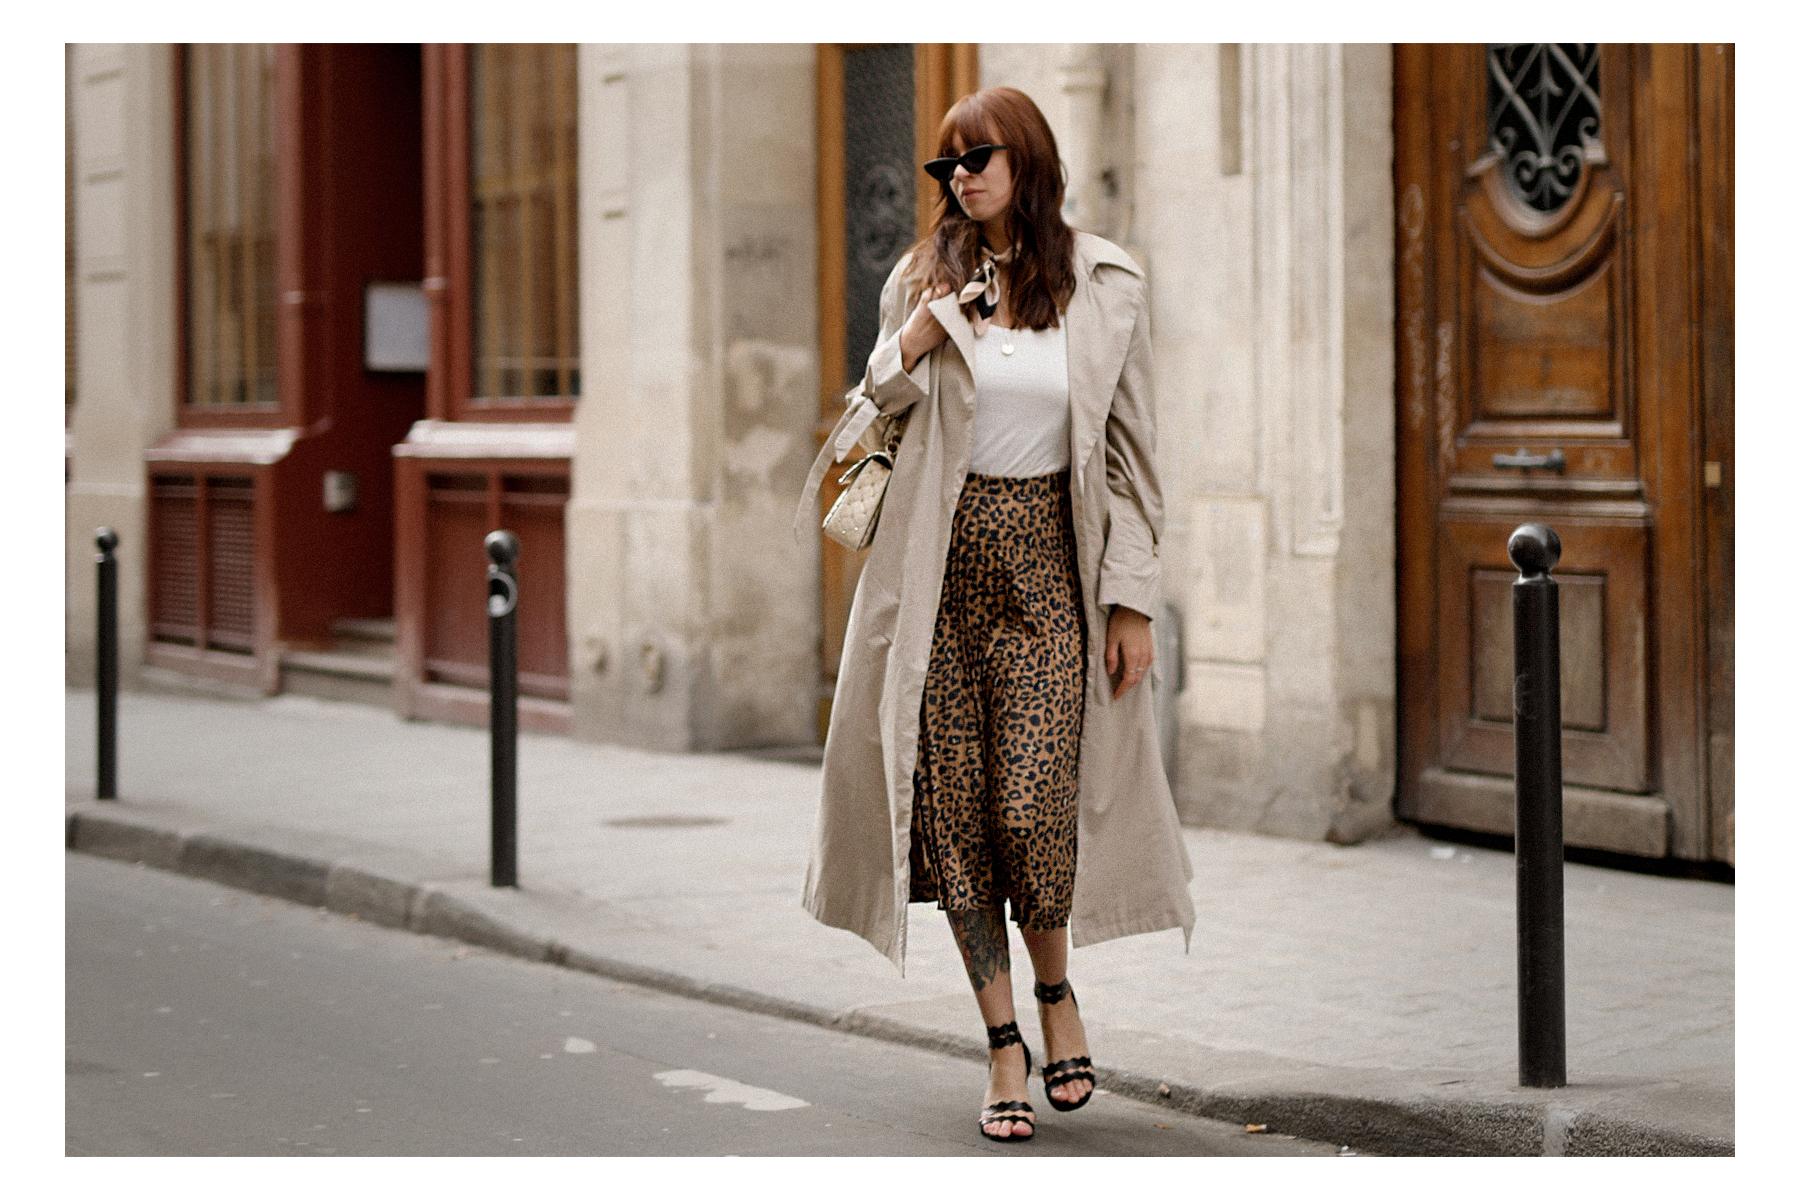 paris love mon amour mint&berry leopard print skirt trench coat valentino rockstud breuninger catsanddogsblog modeblogger styleblog modeblog outfitblog parisienne styliste cats&dogs max bechmann fotografie film düsseldorf 4